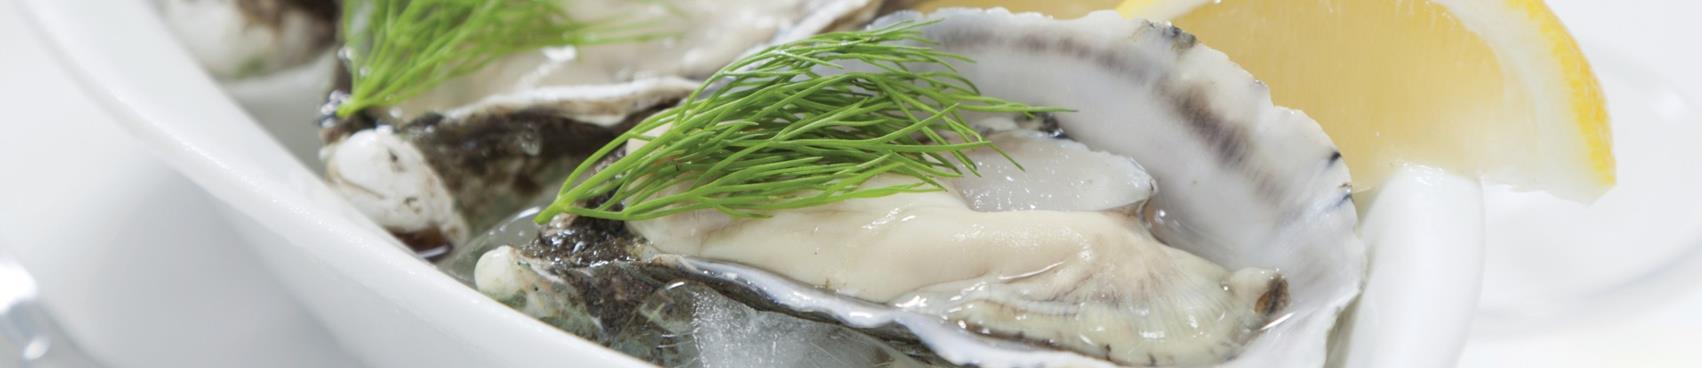 Aww, Shucks! Oysters & Sauvignon Blanc